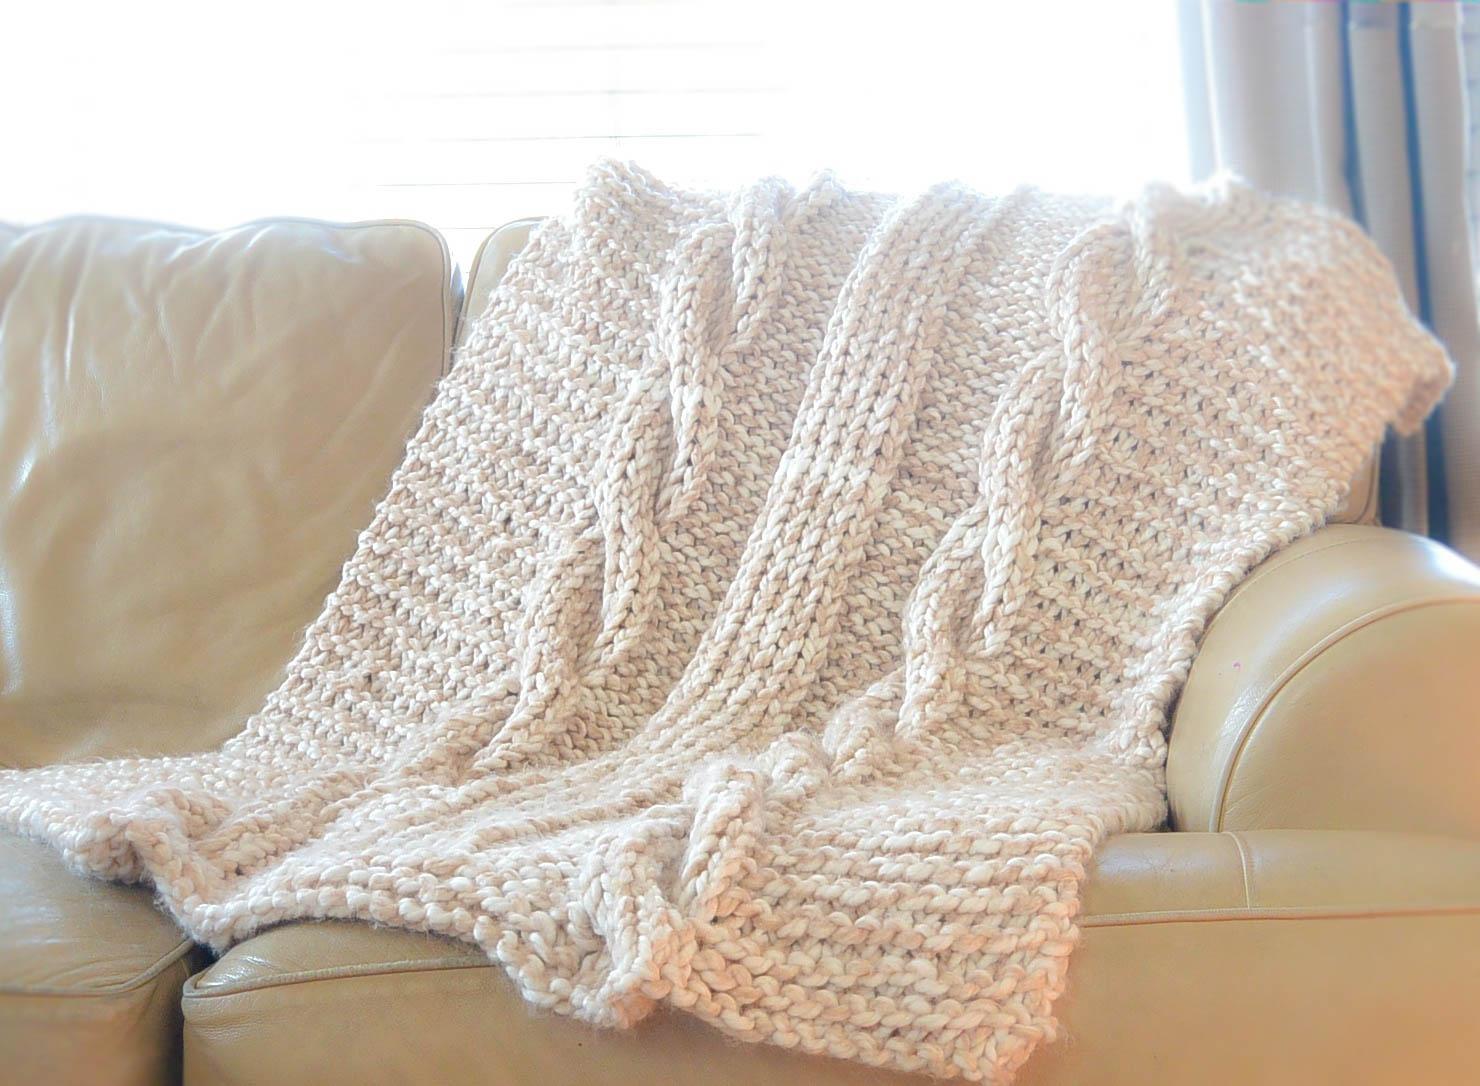 Fullsize Of Cable Knit Blanket